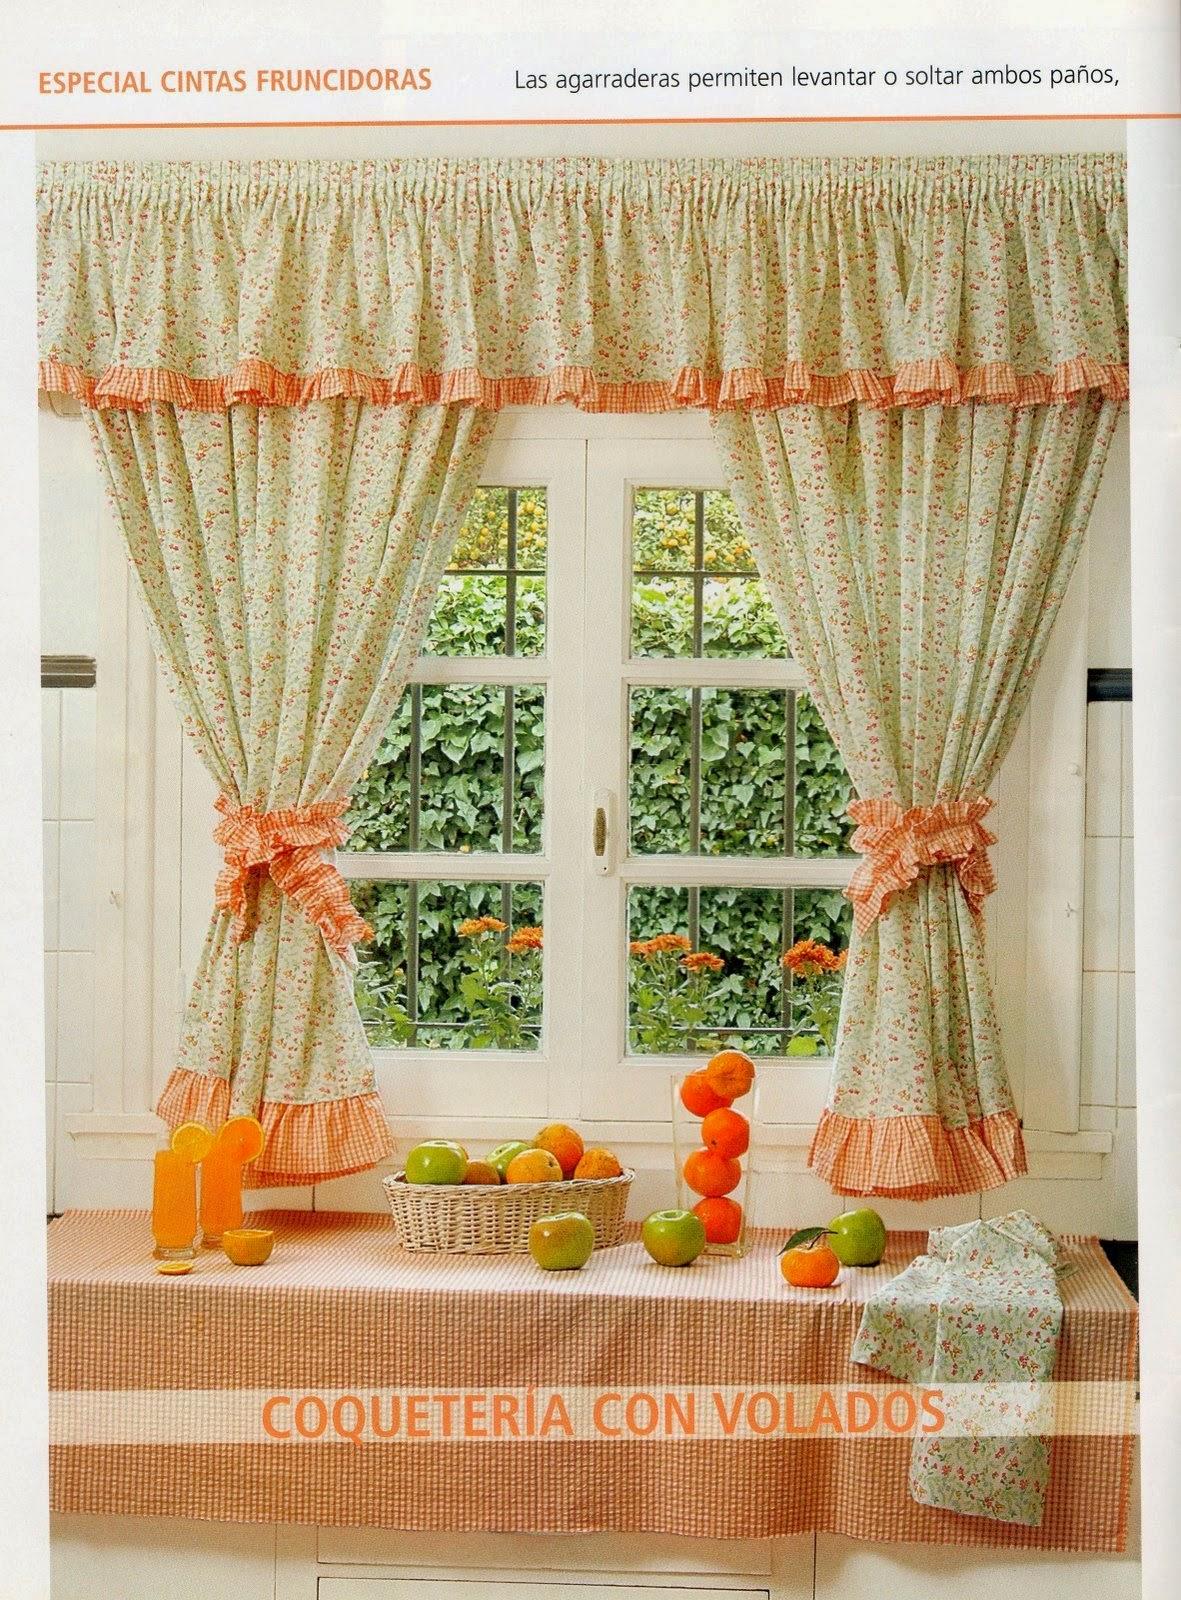 Como hacer cortinas paso a paso revistas de manualidades for Manualidades con tela paso a paso